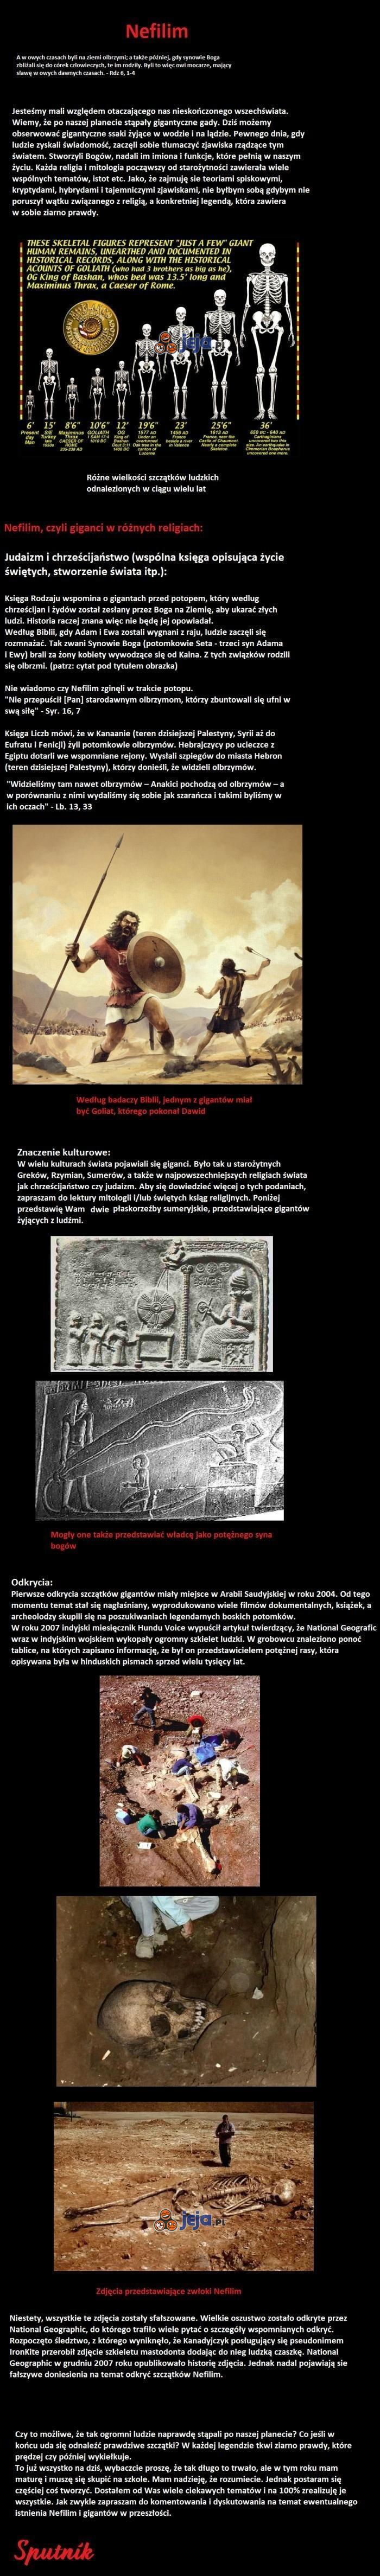 Nefilim - legendarni giganci